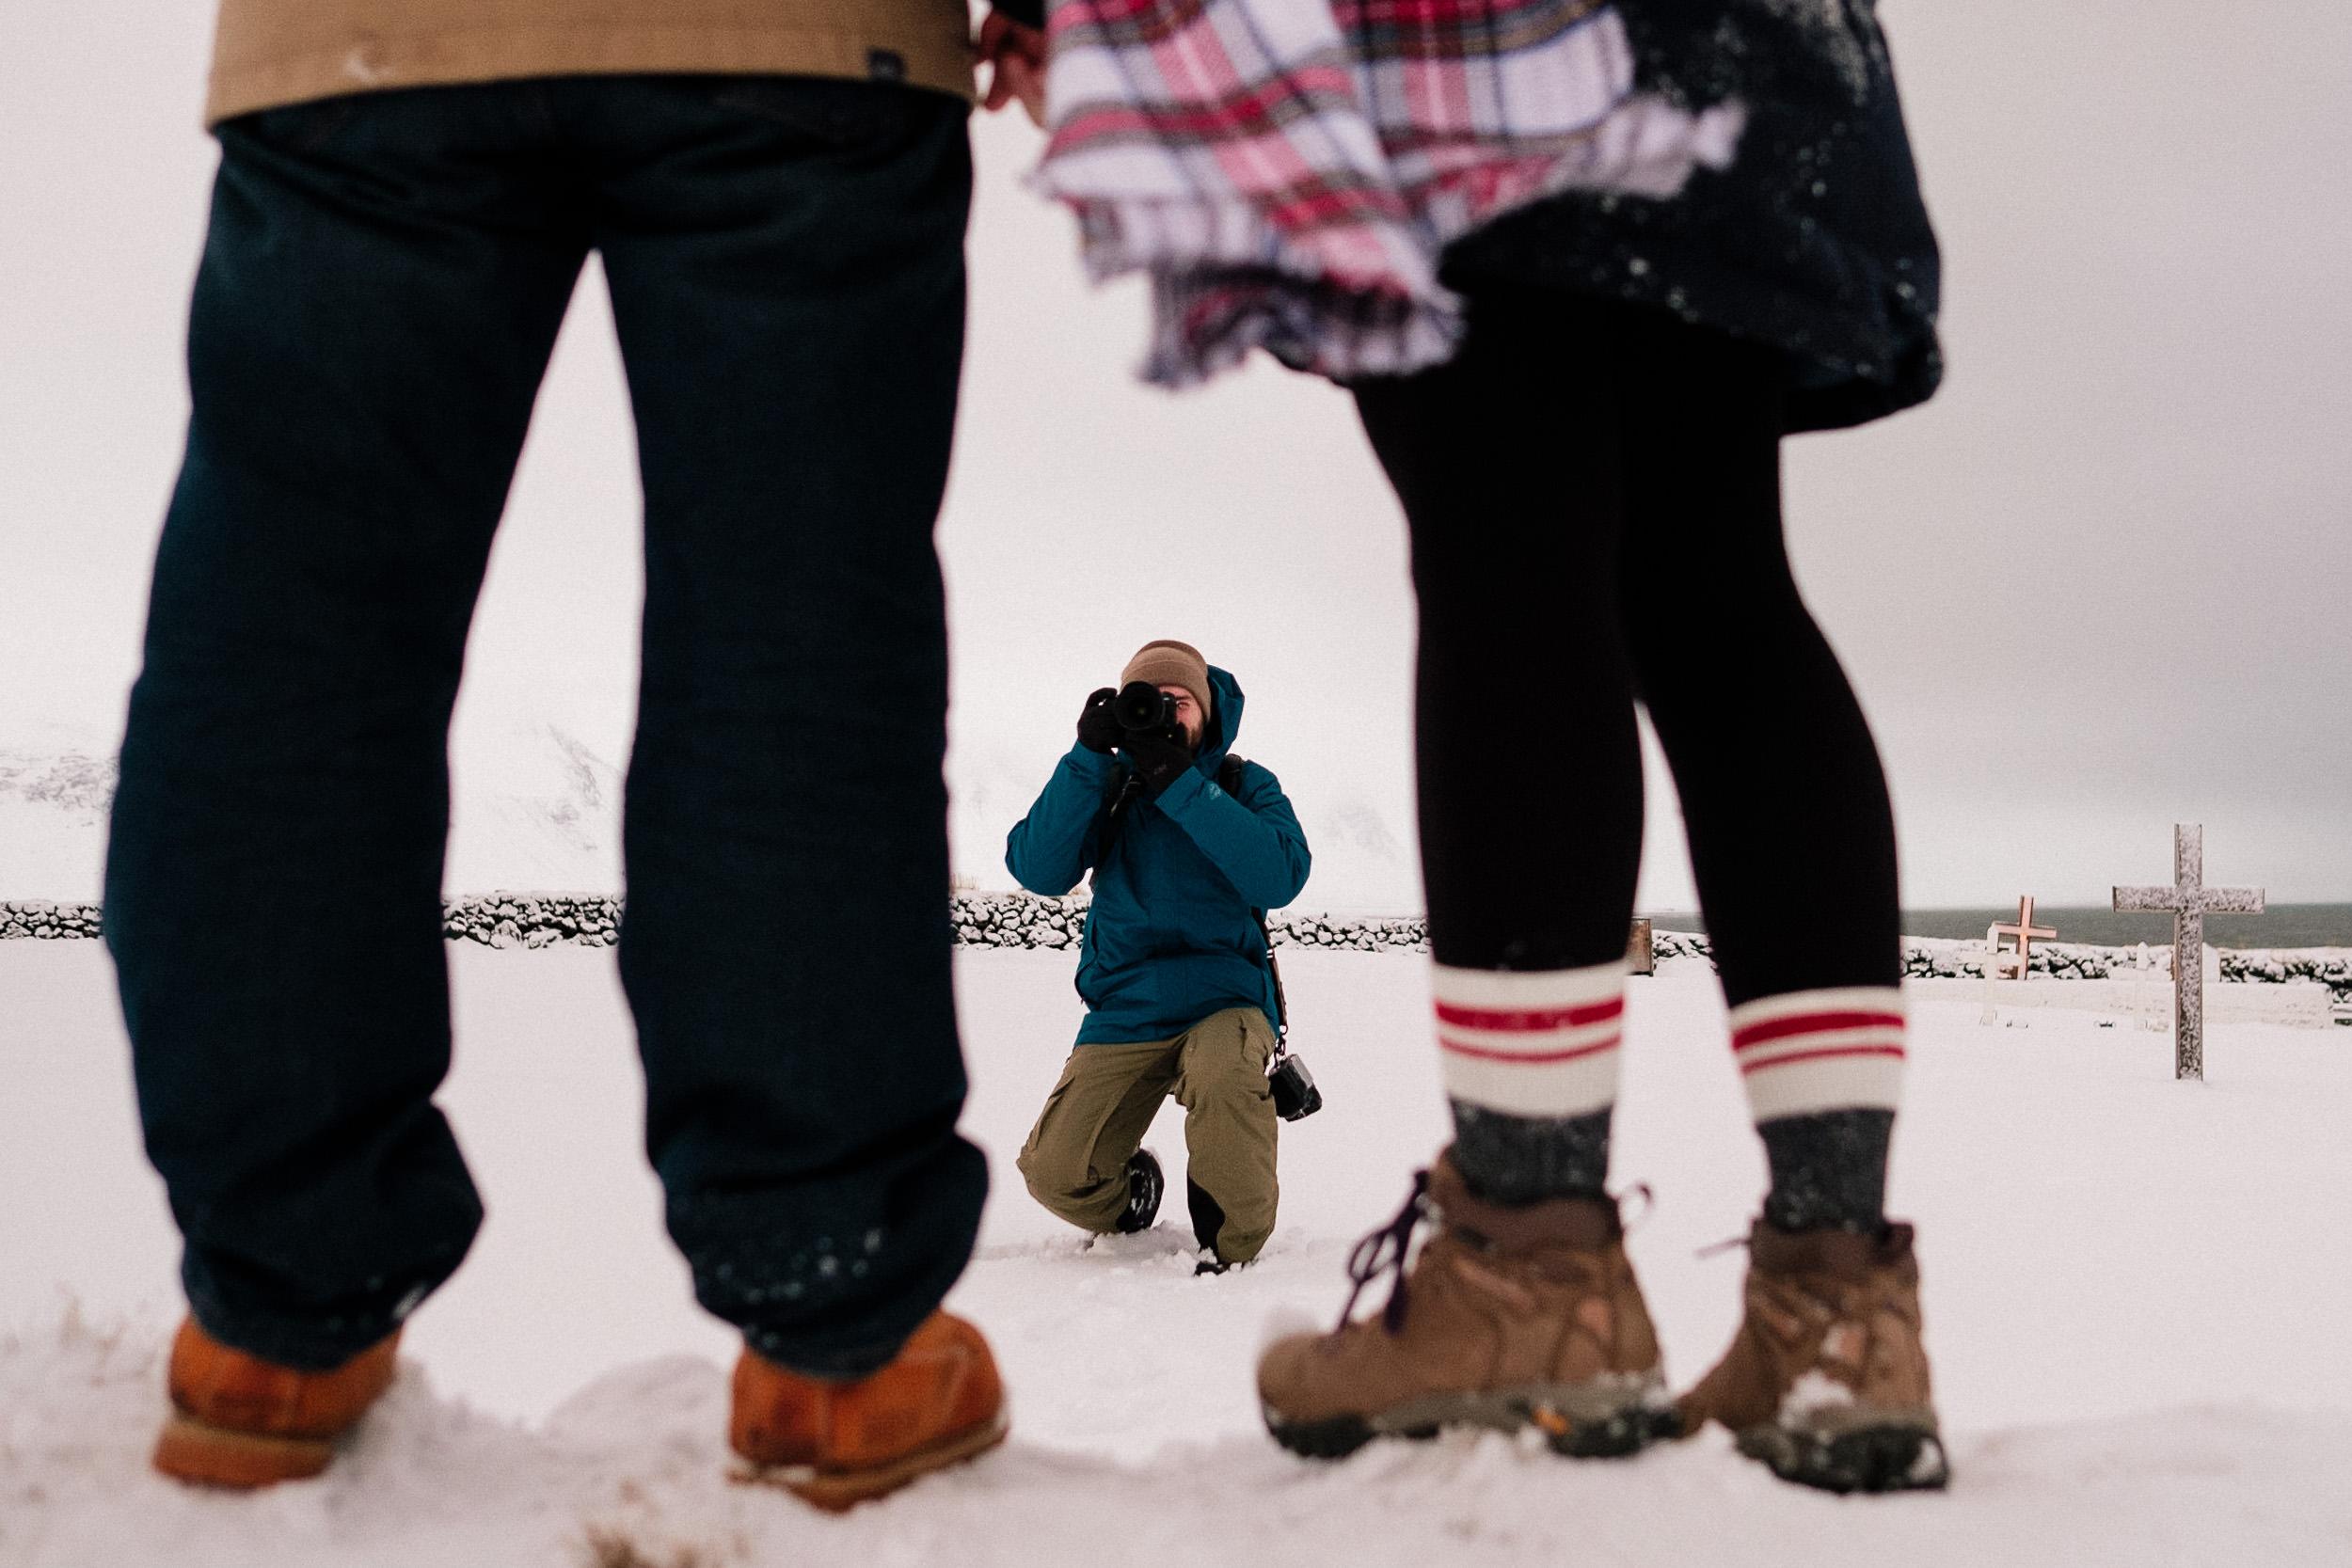 Collective_Wander_Iceland_Photographers_Trip_025.jpg